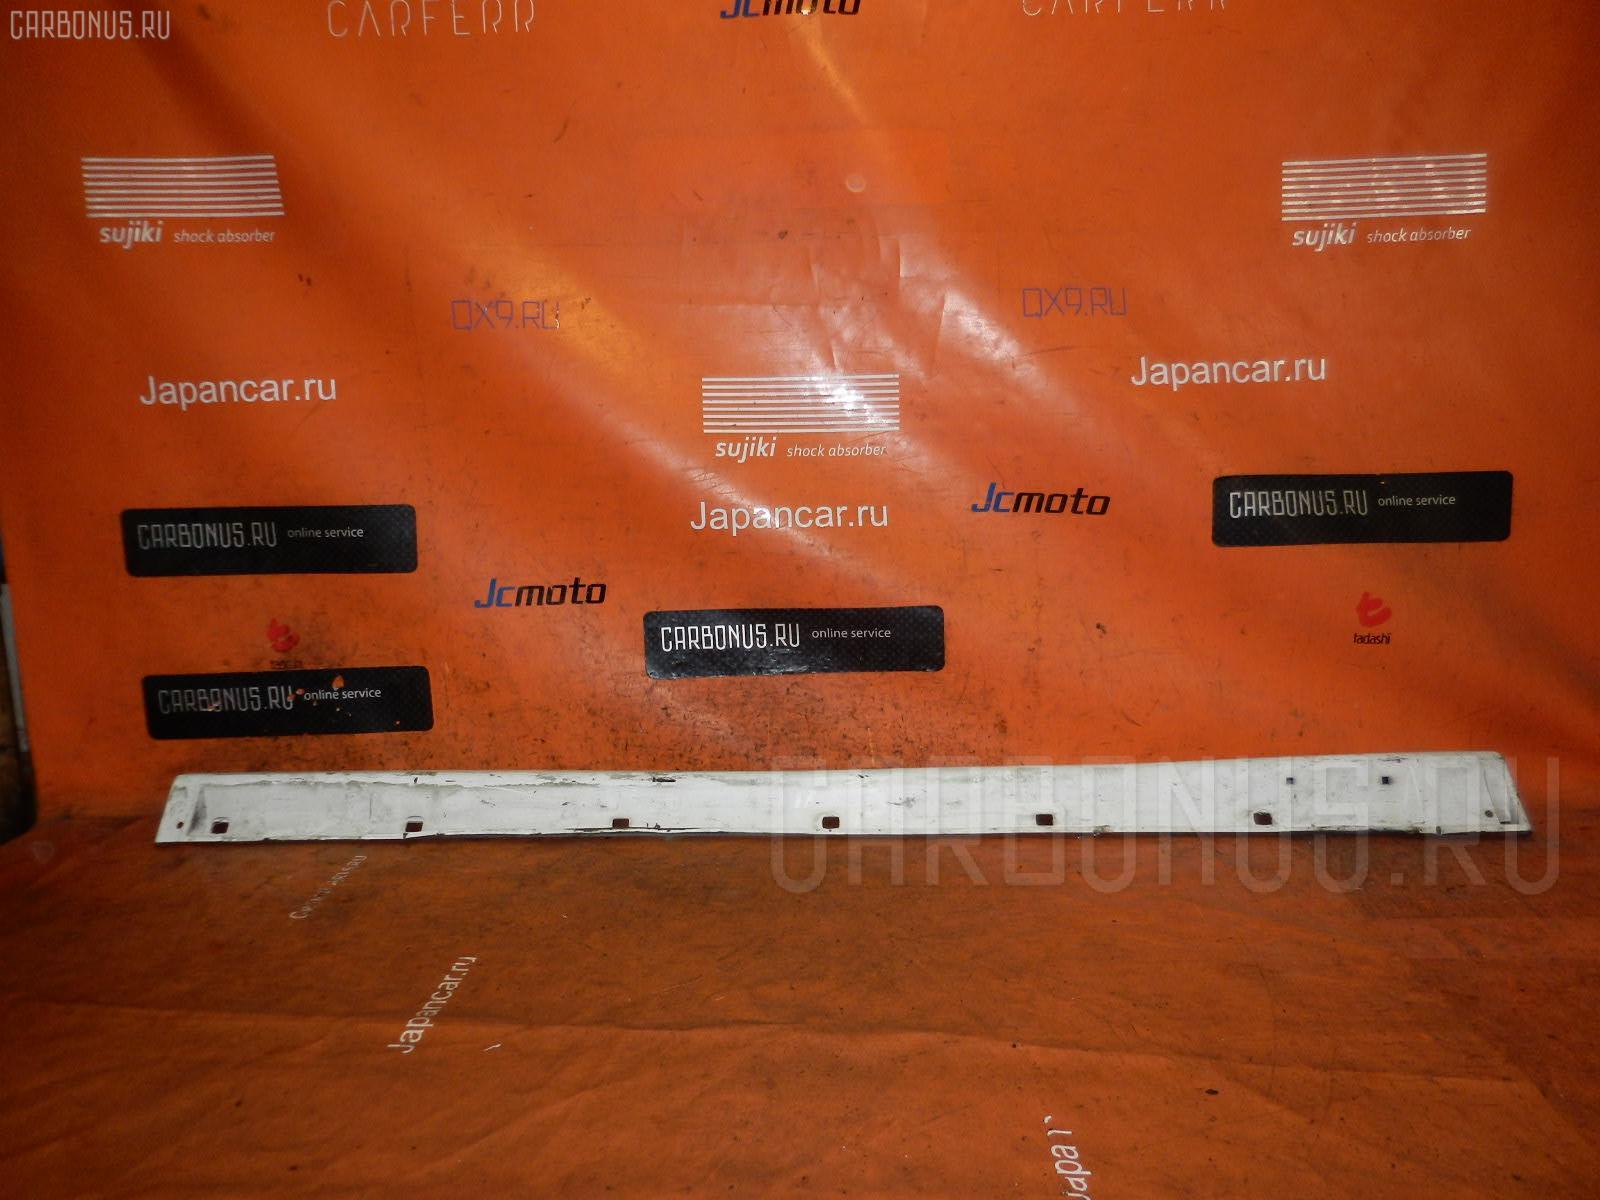 Порог кузова пластиковый ( обвес ) SUBARU LEGACY WAGON BH9 Фото 3